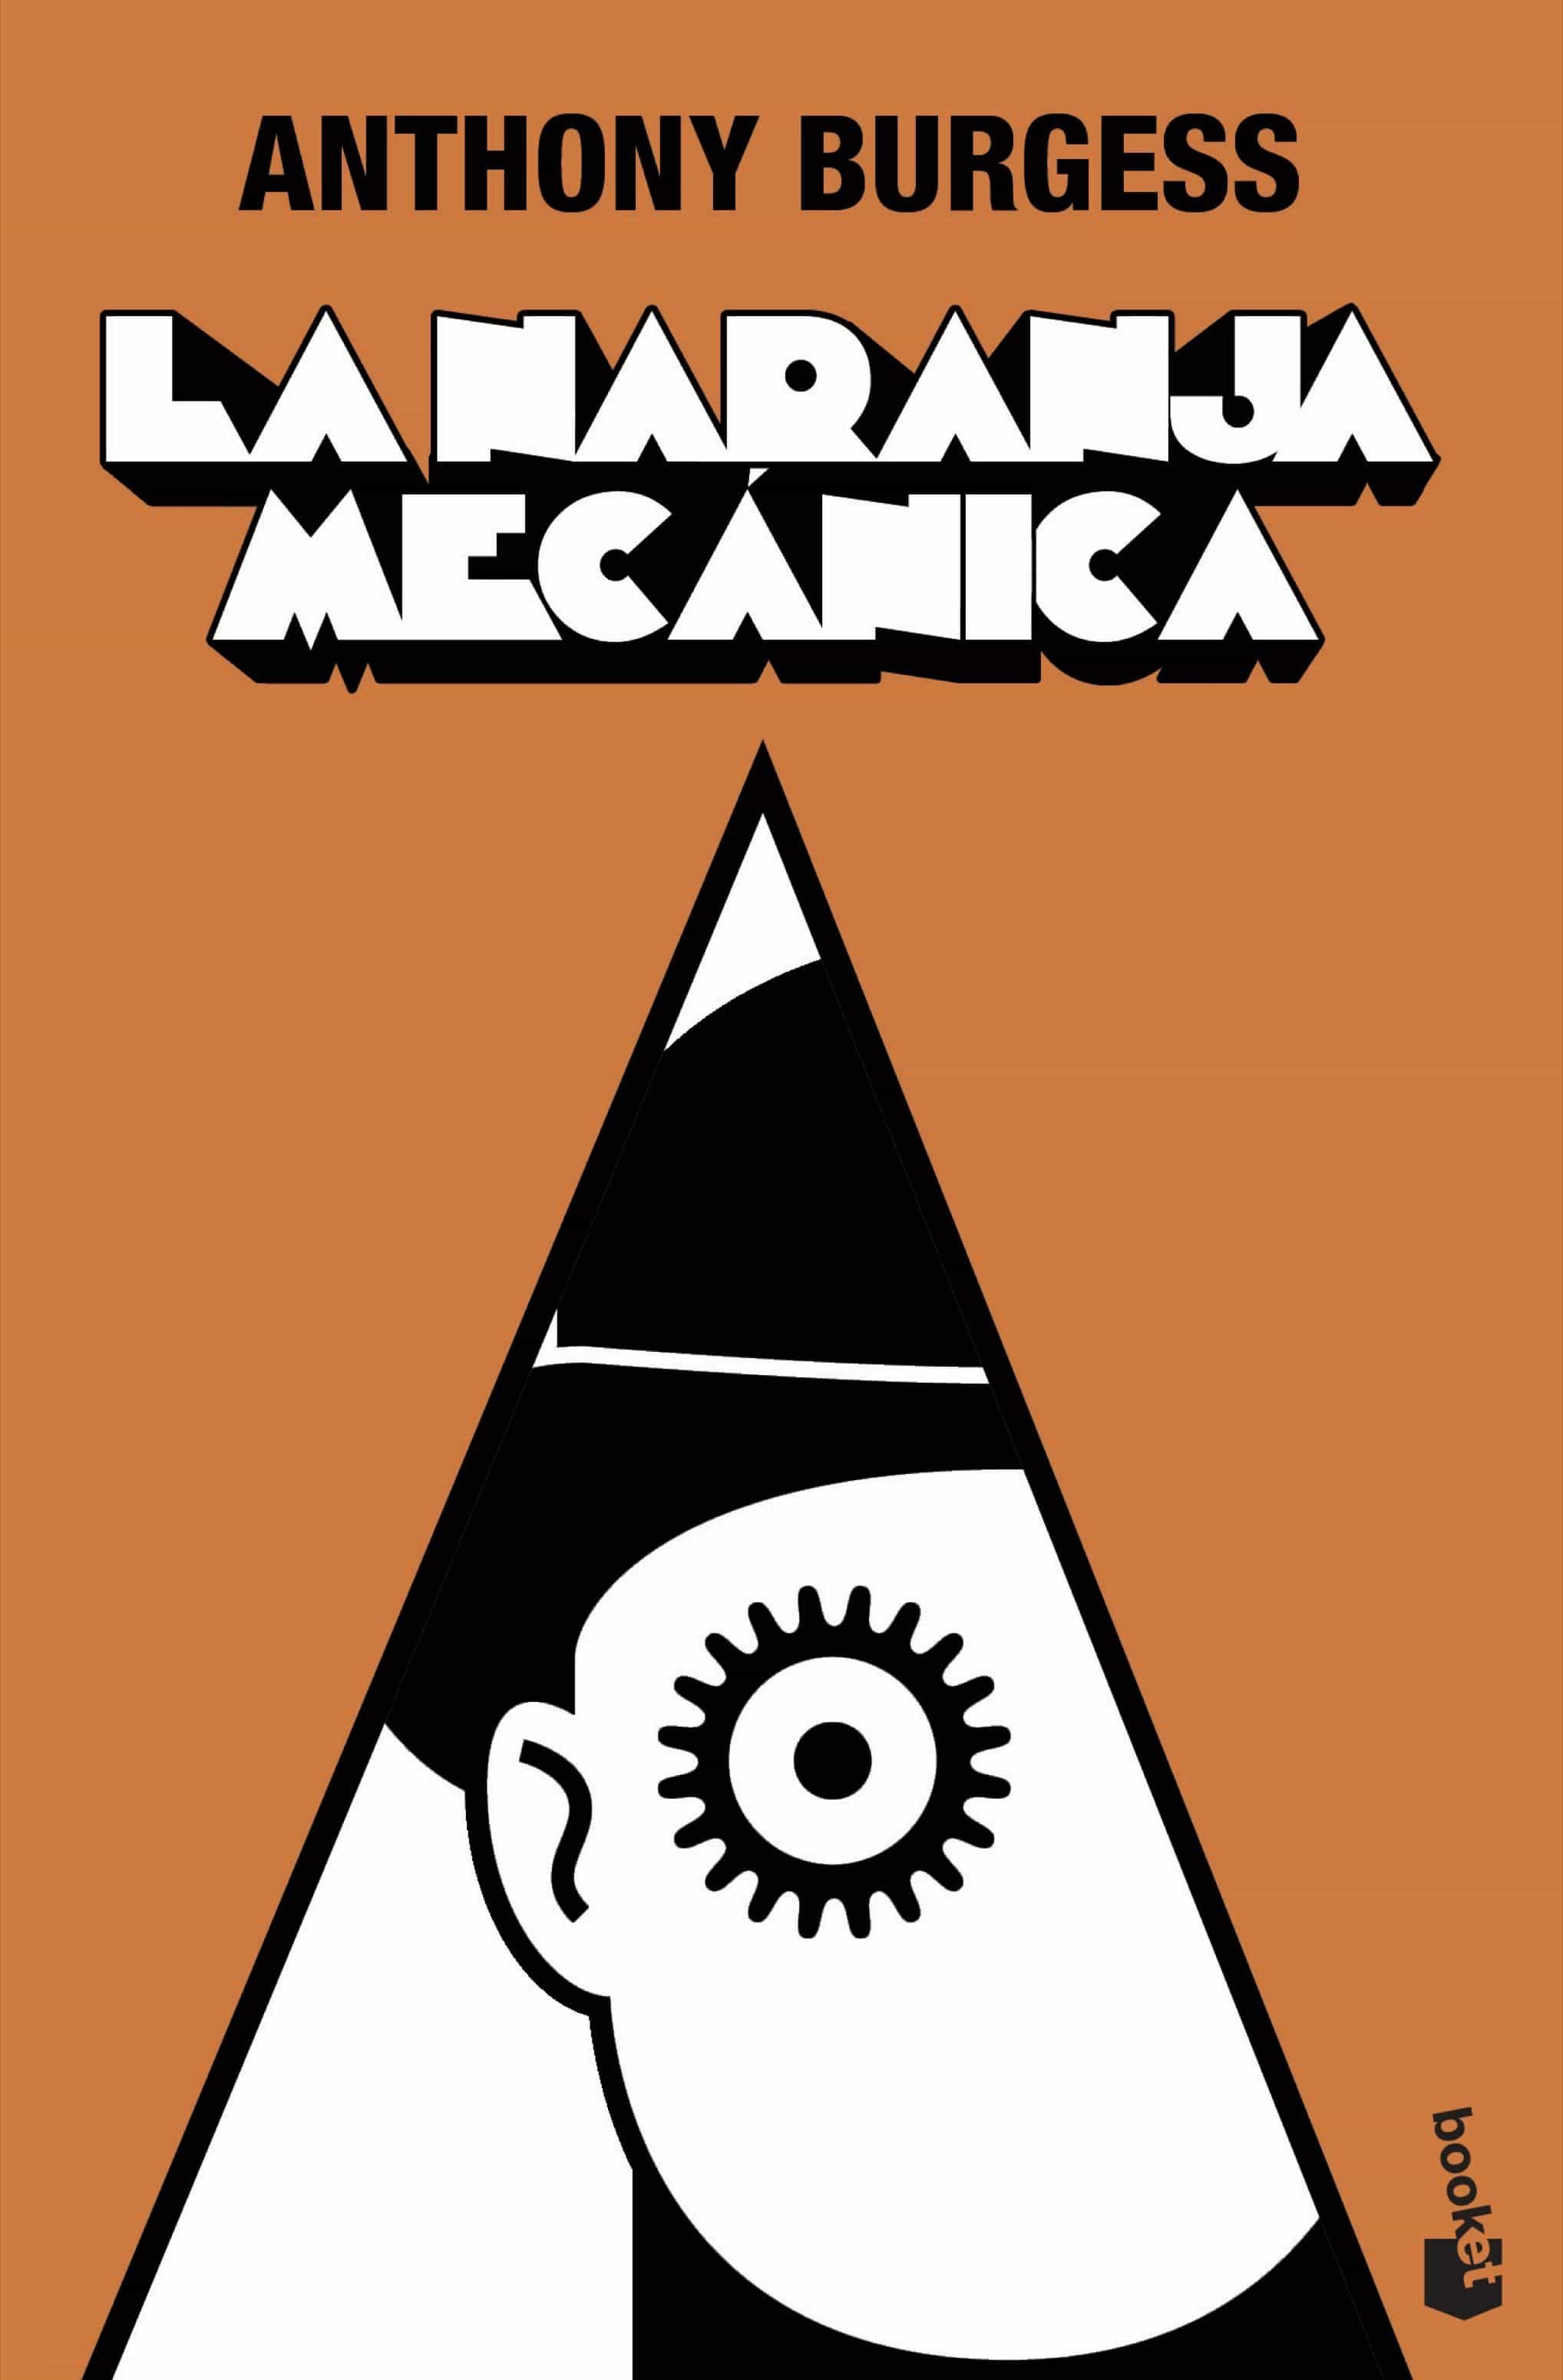 LA NARANJA MECANICA LIBRO EPUB DOWNLOAD